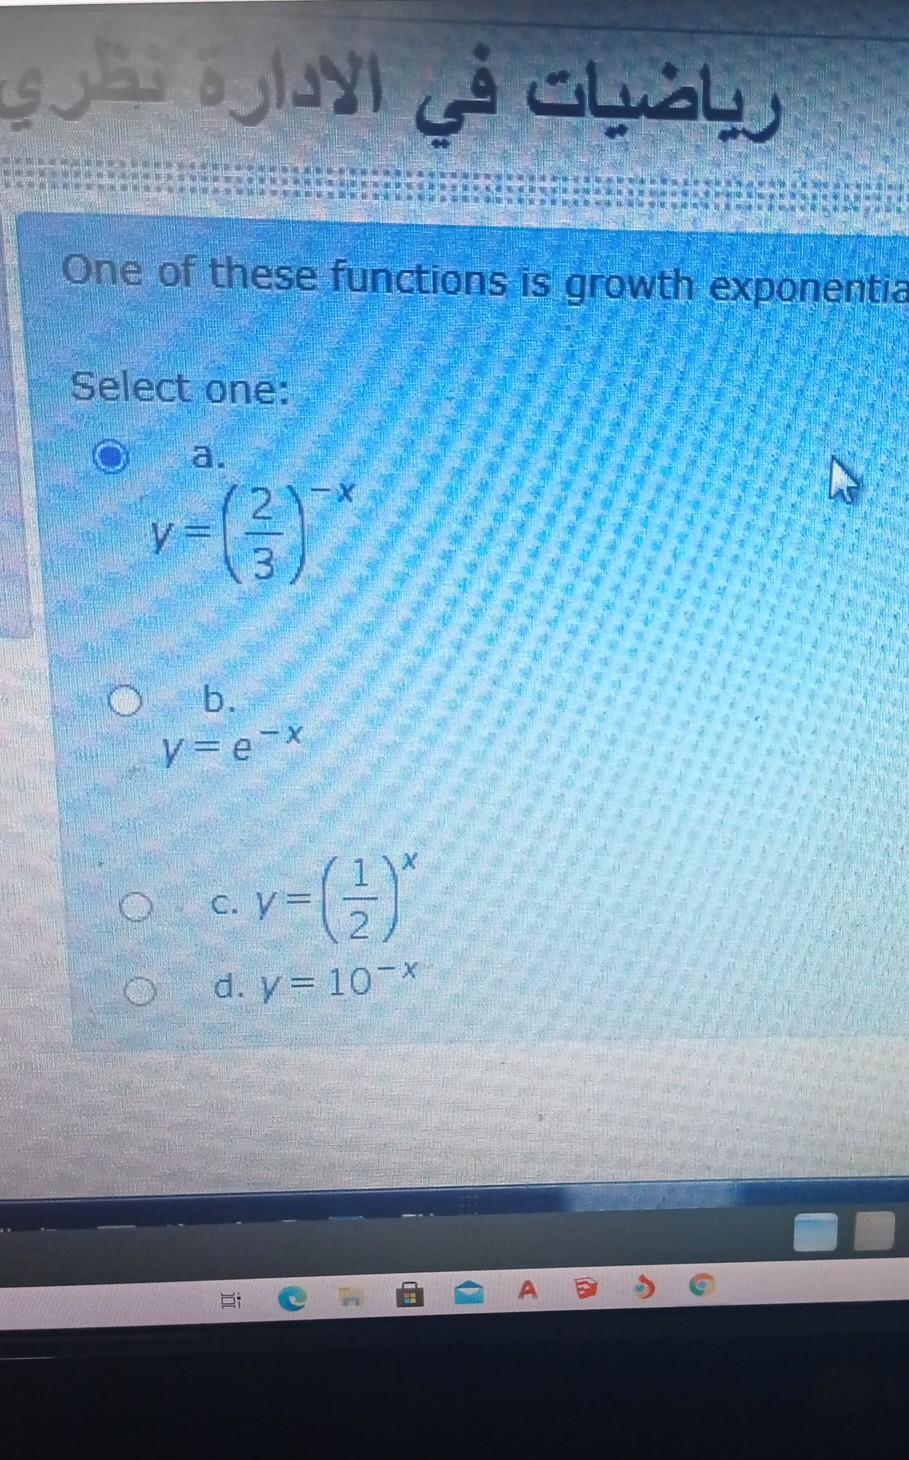 رياضيات في الادارة سري One of these functions is growth exponentia Select one: WIN b. v=e-* C, V- 7= (3) d. = 10-X - م